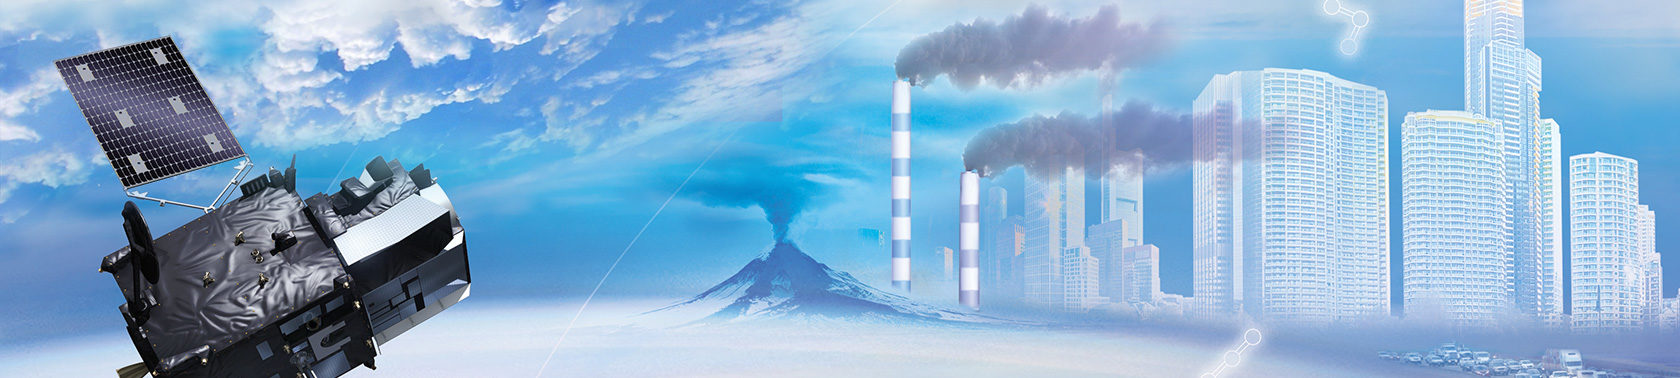 Science blog banner MOOC atmospheric composition